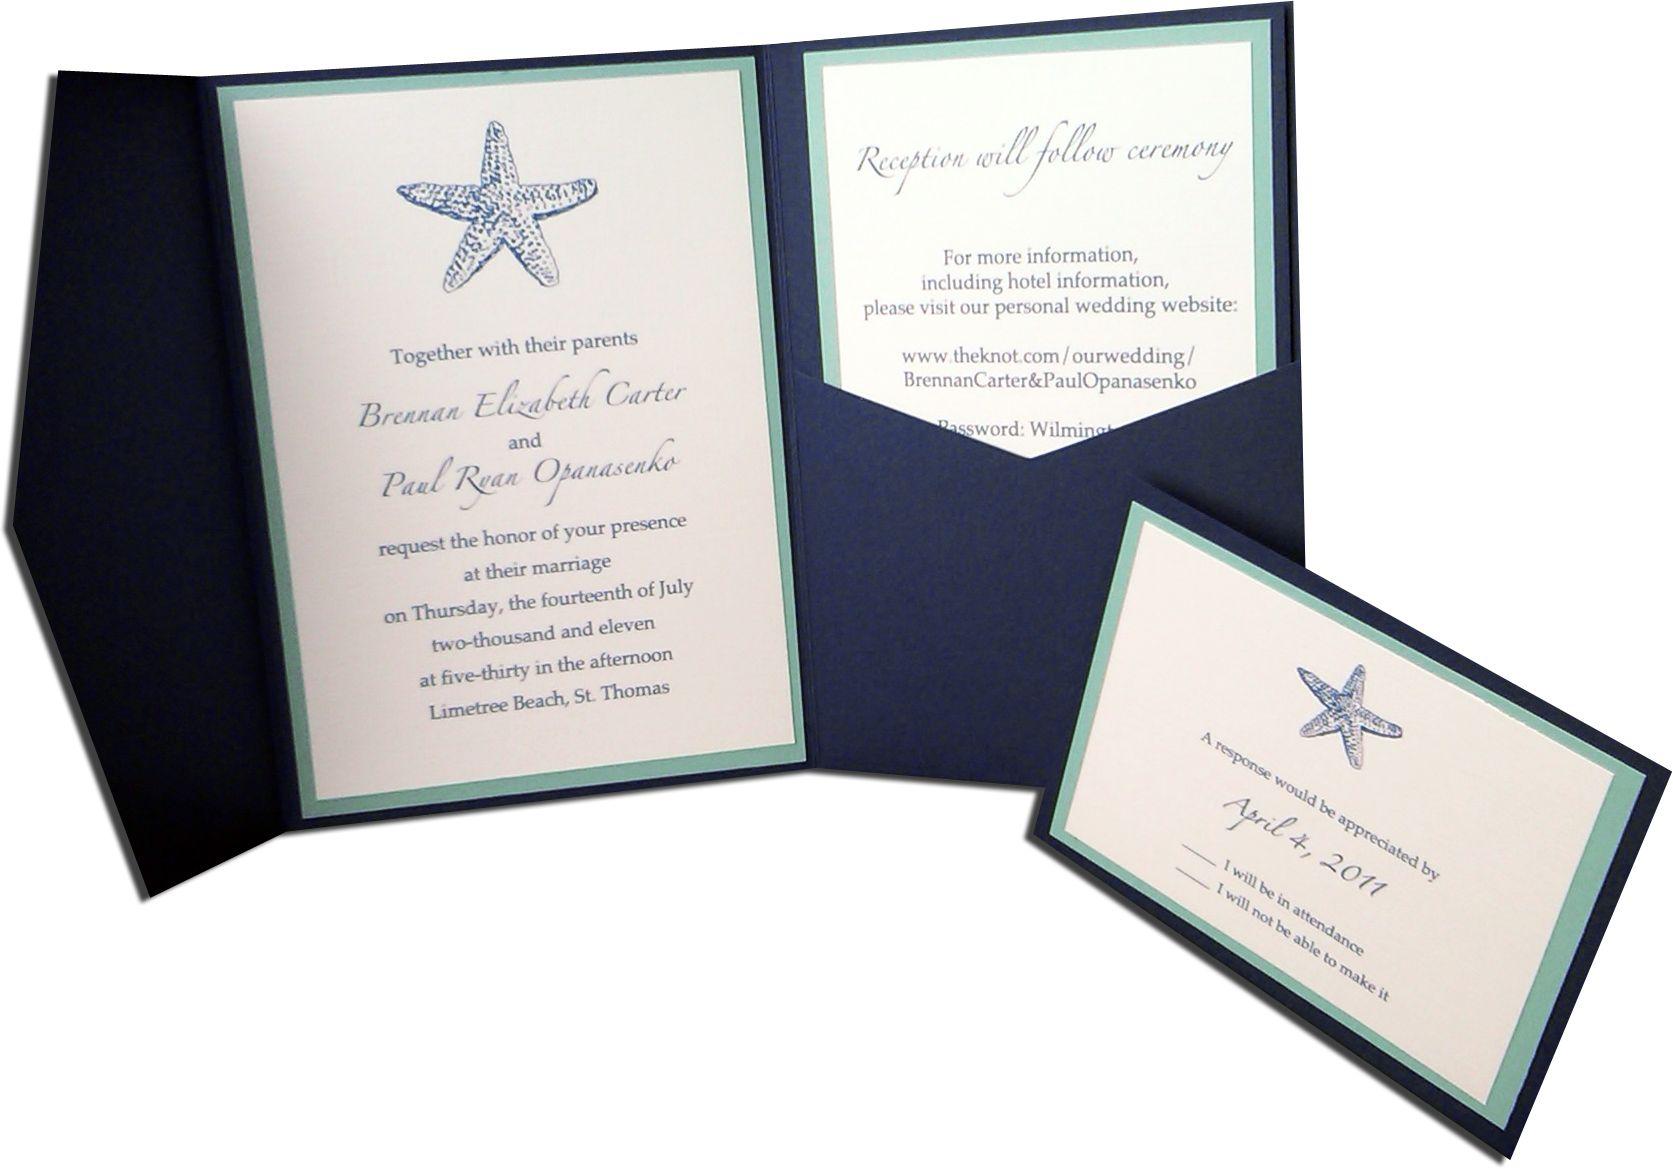 Destination Beach Wedding Invitation & RSVP card | Invitations ...